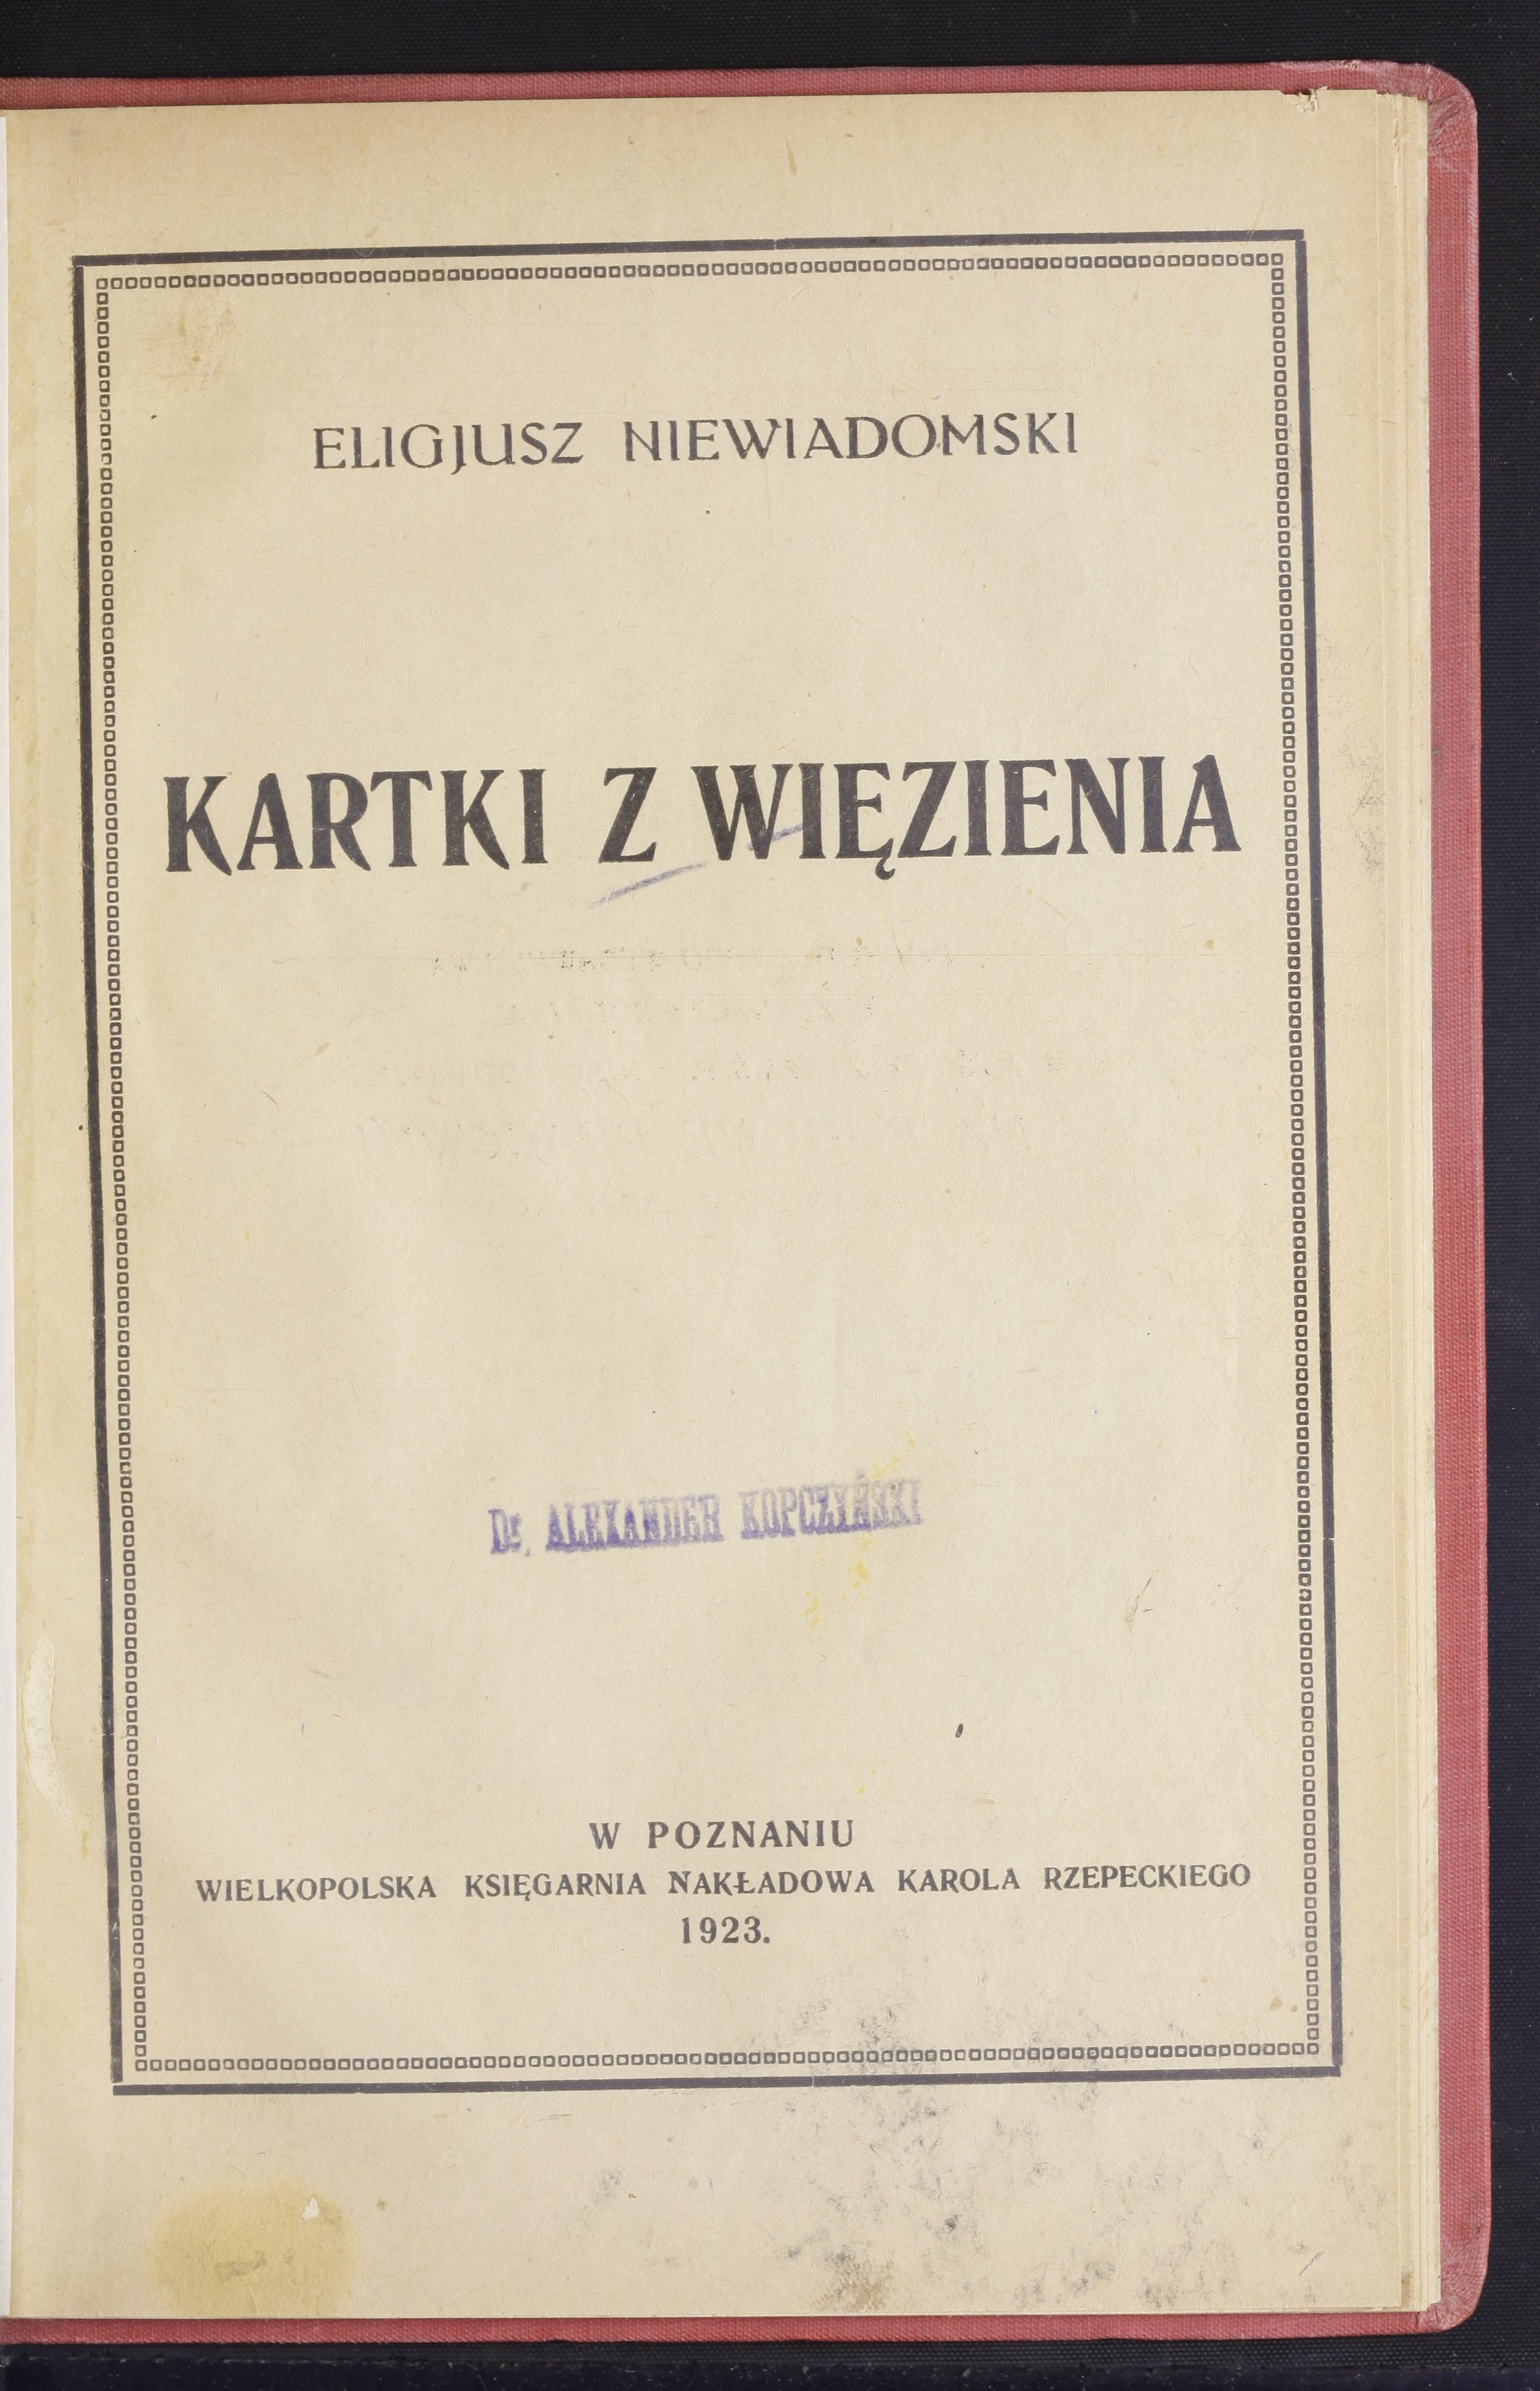 http://piekarscy.com.pl/wp-content/uploads/2018/04/NzI1NTI0NTM.73648840.jpg